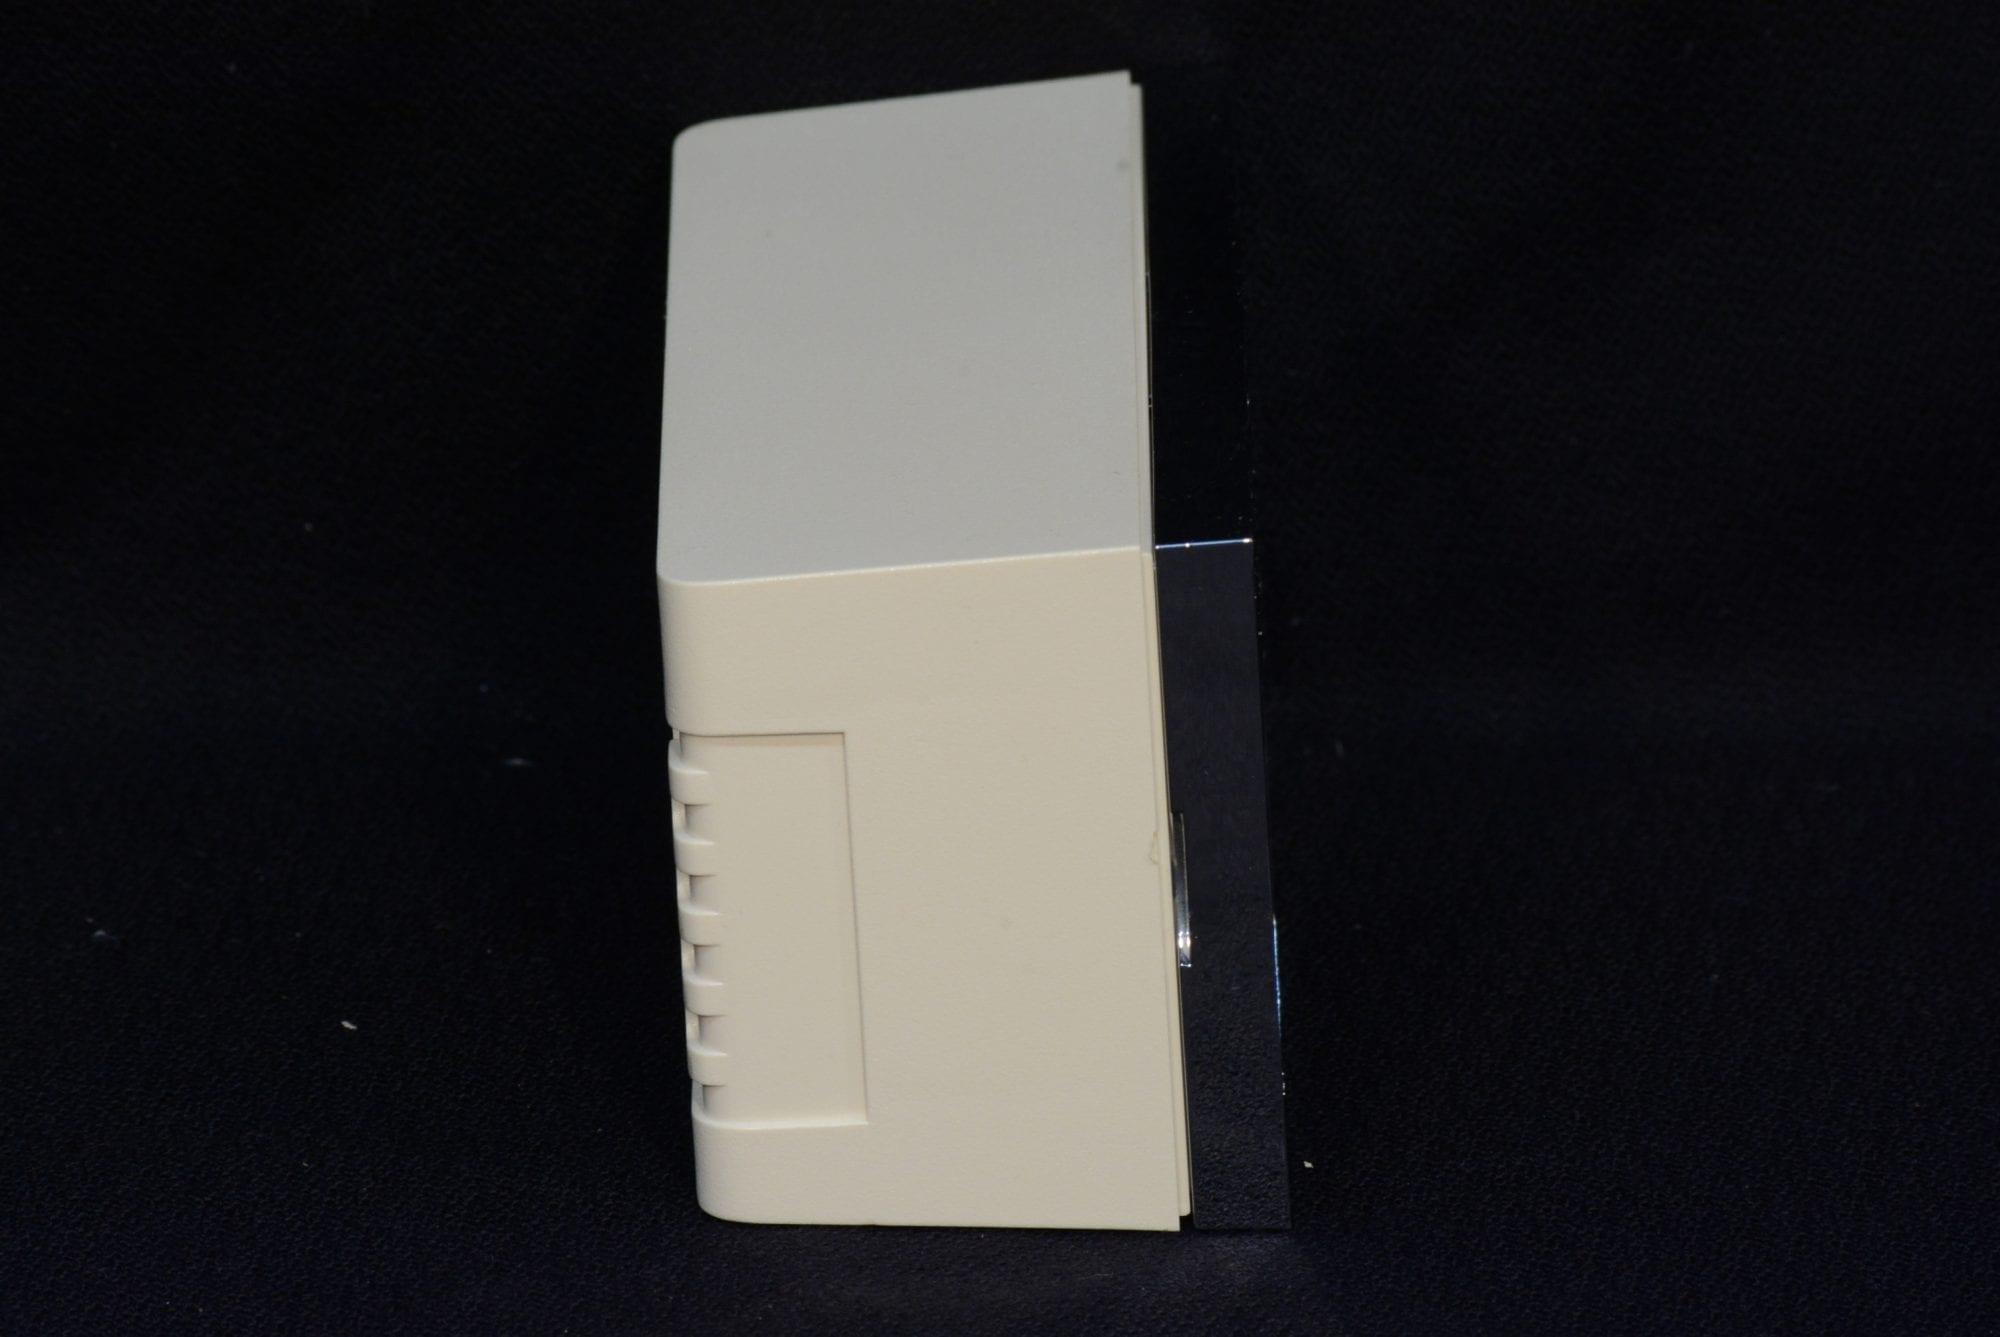 Racal Pir Motion Detector Wayne Alarm Systems